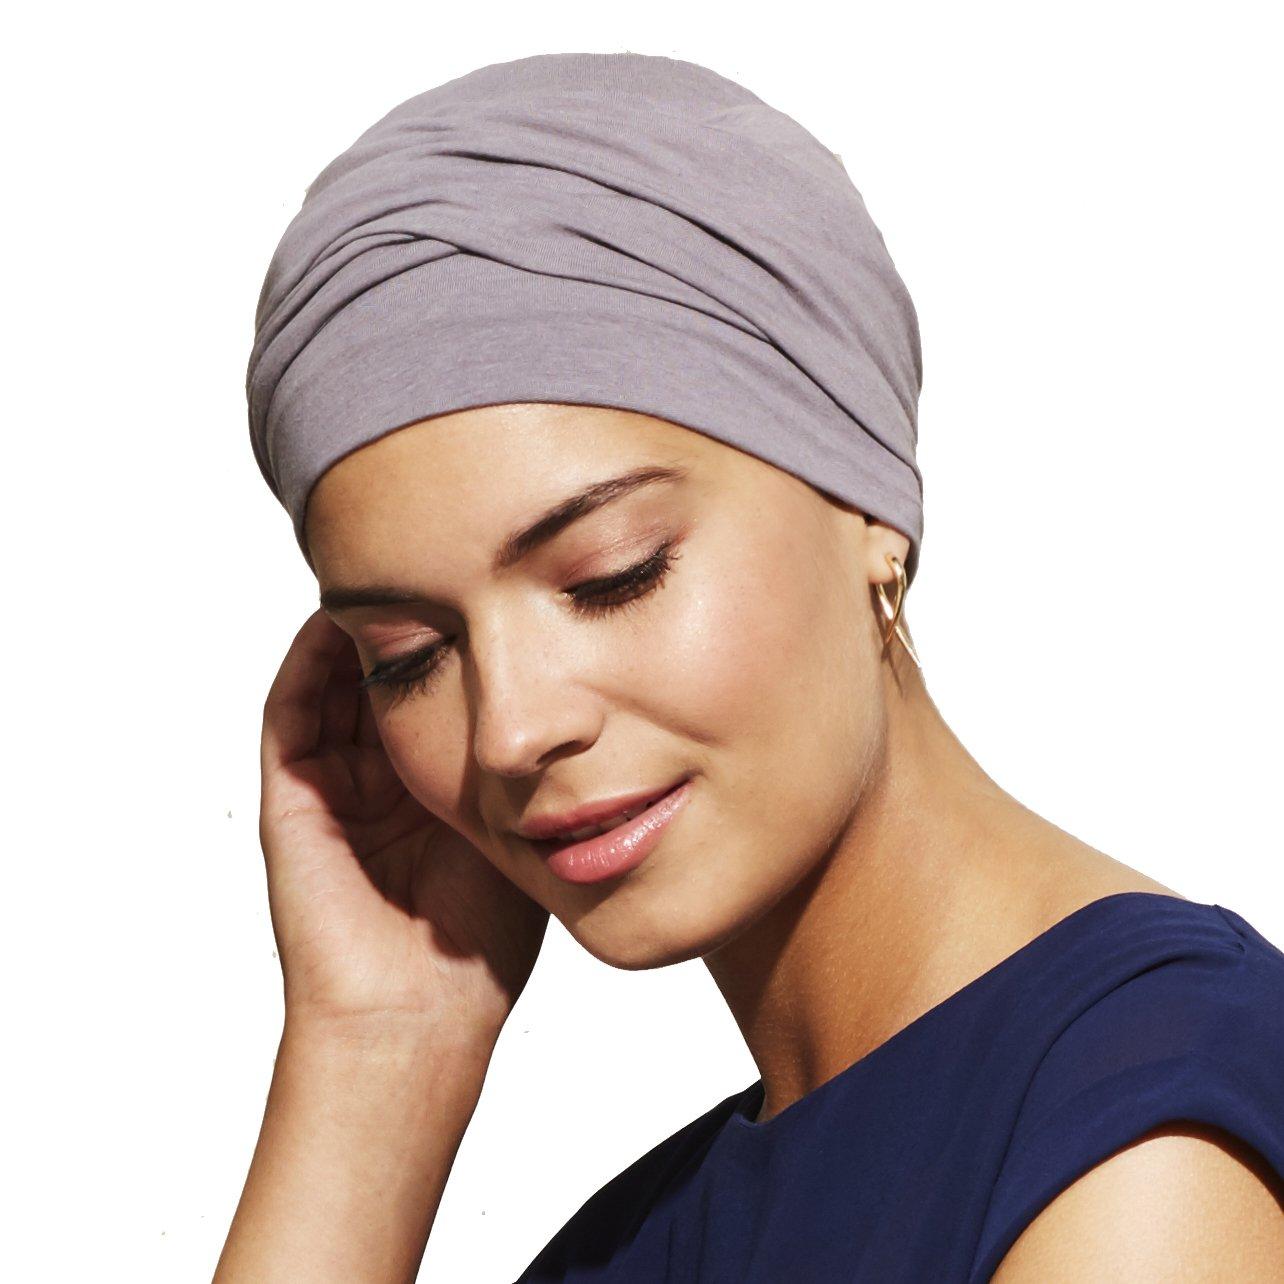 Turbante Zoya grigio viola per le donne con alopecia